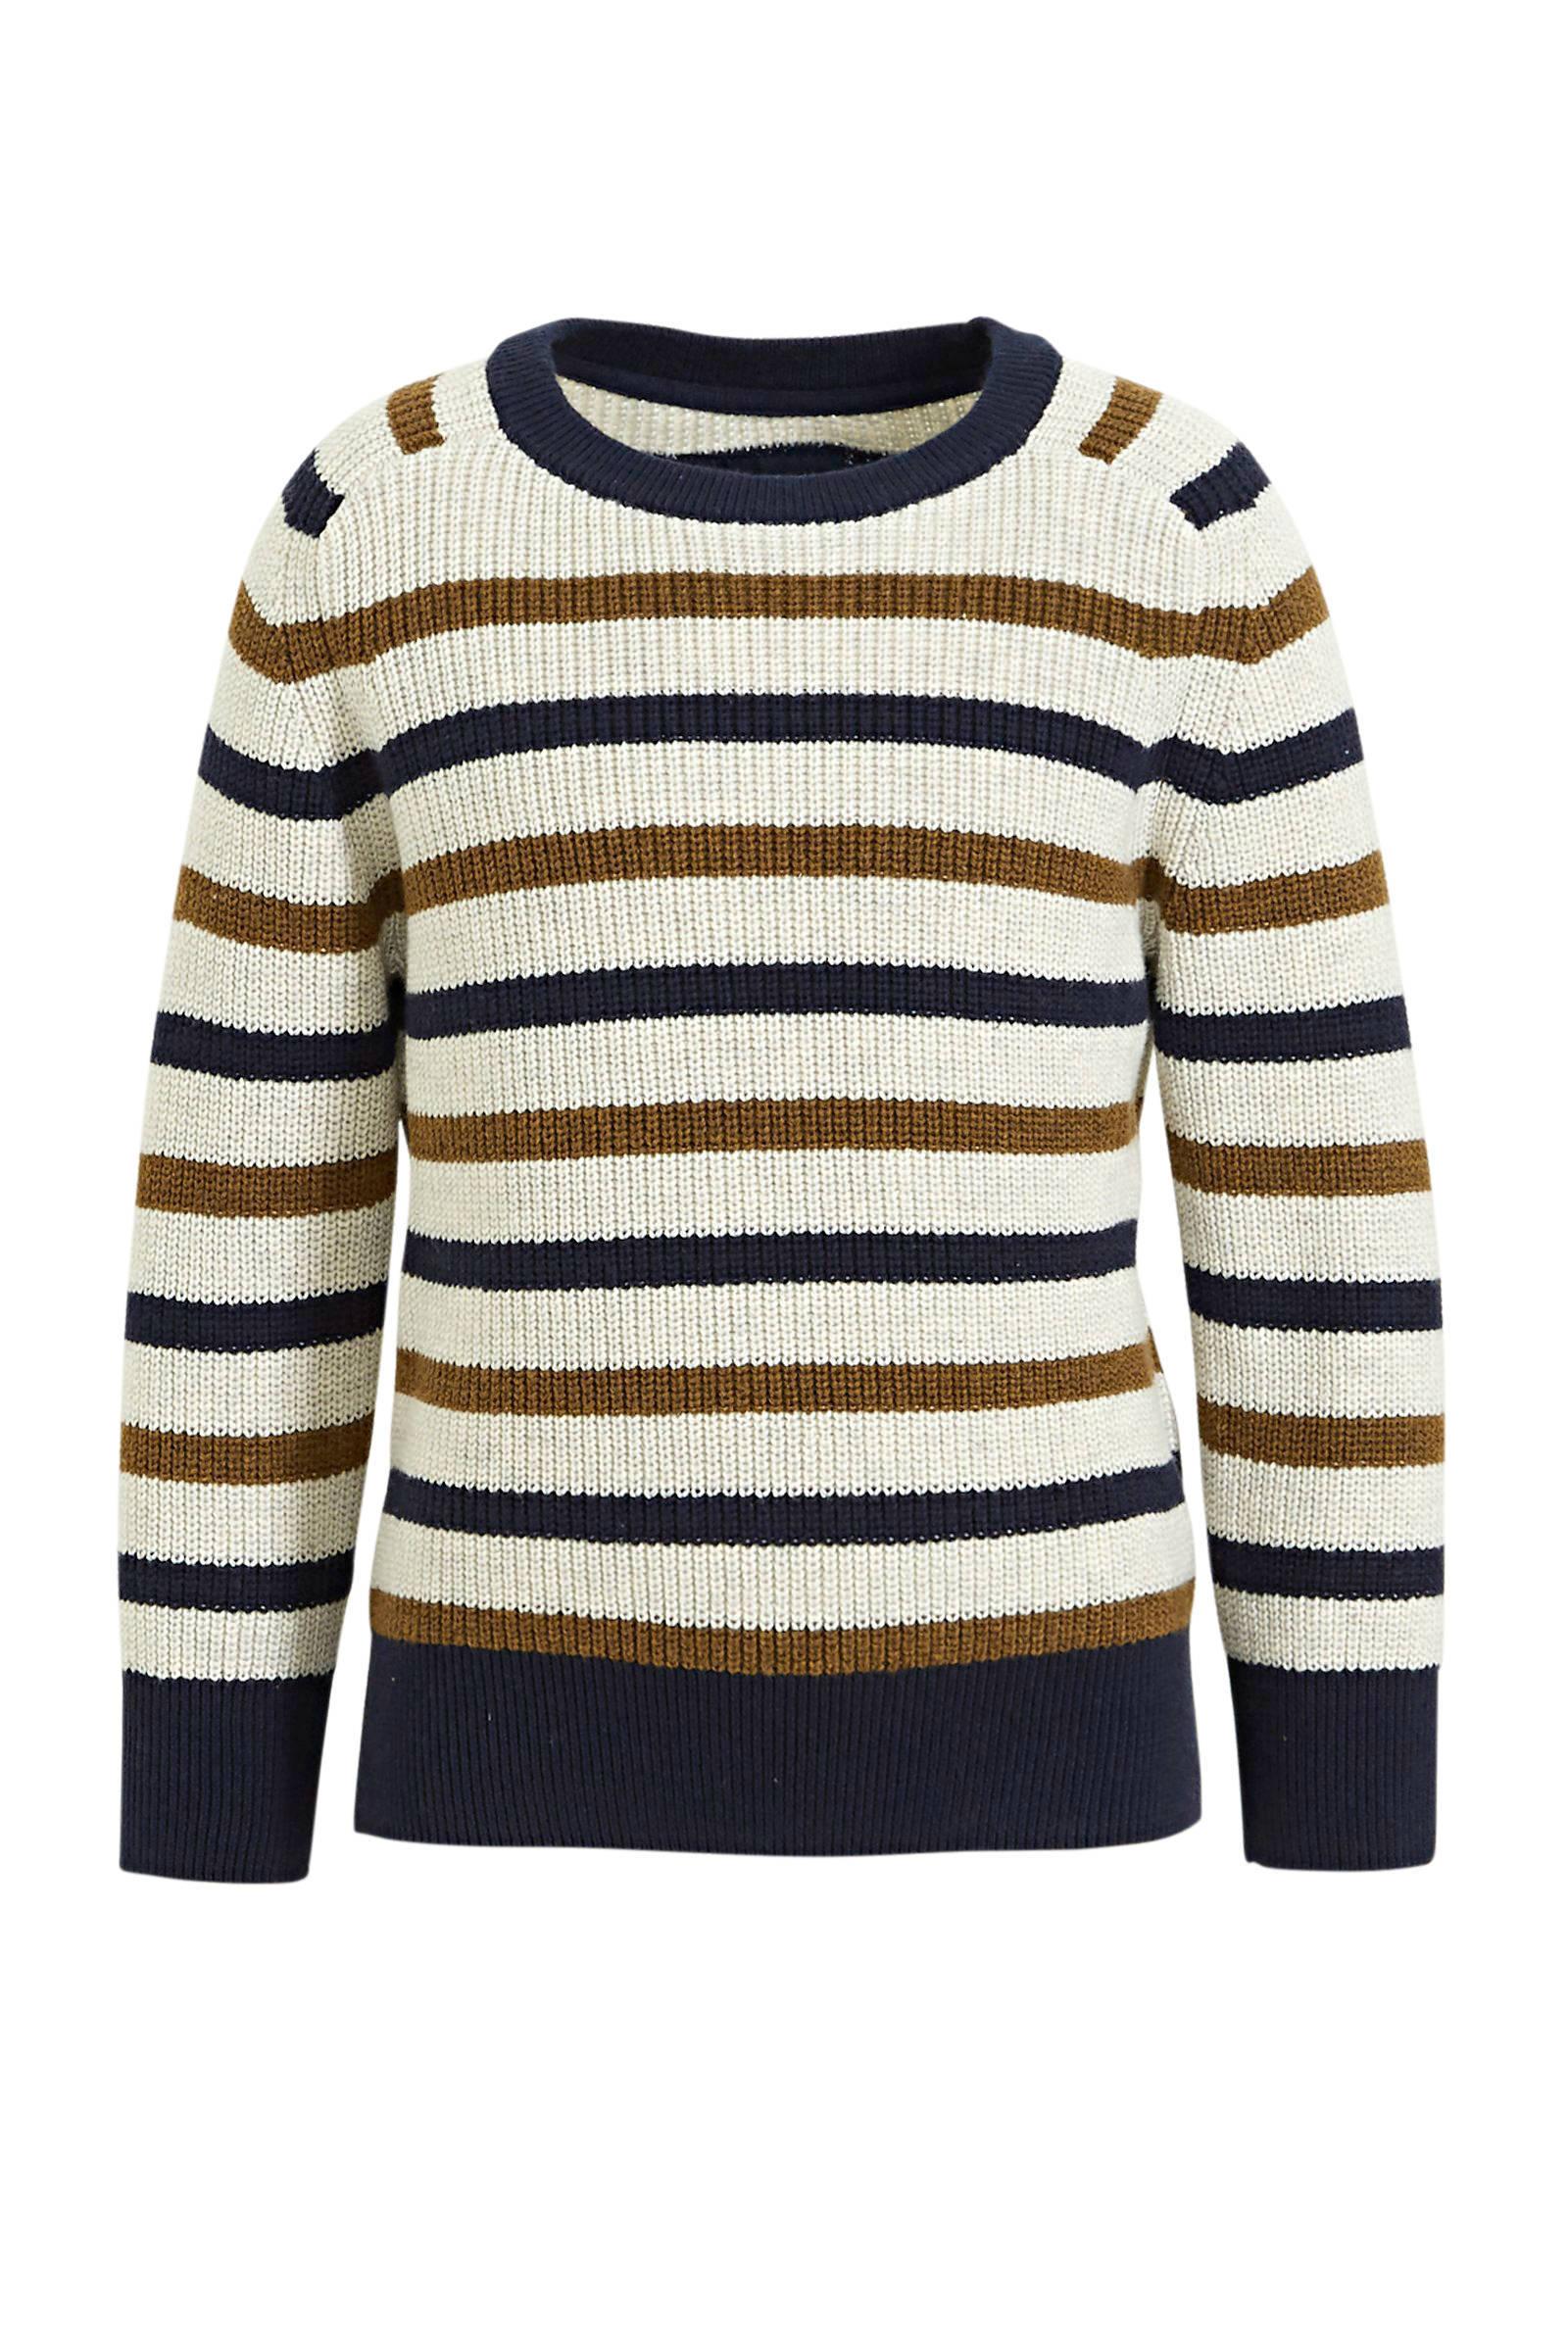 C&A gestreepte trui lichtgrijsblauwrood | wehkamp